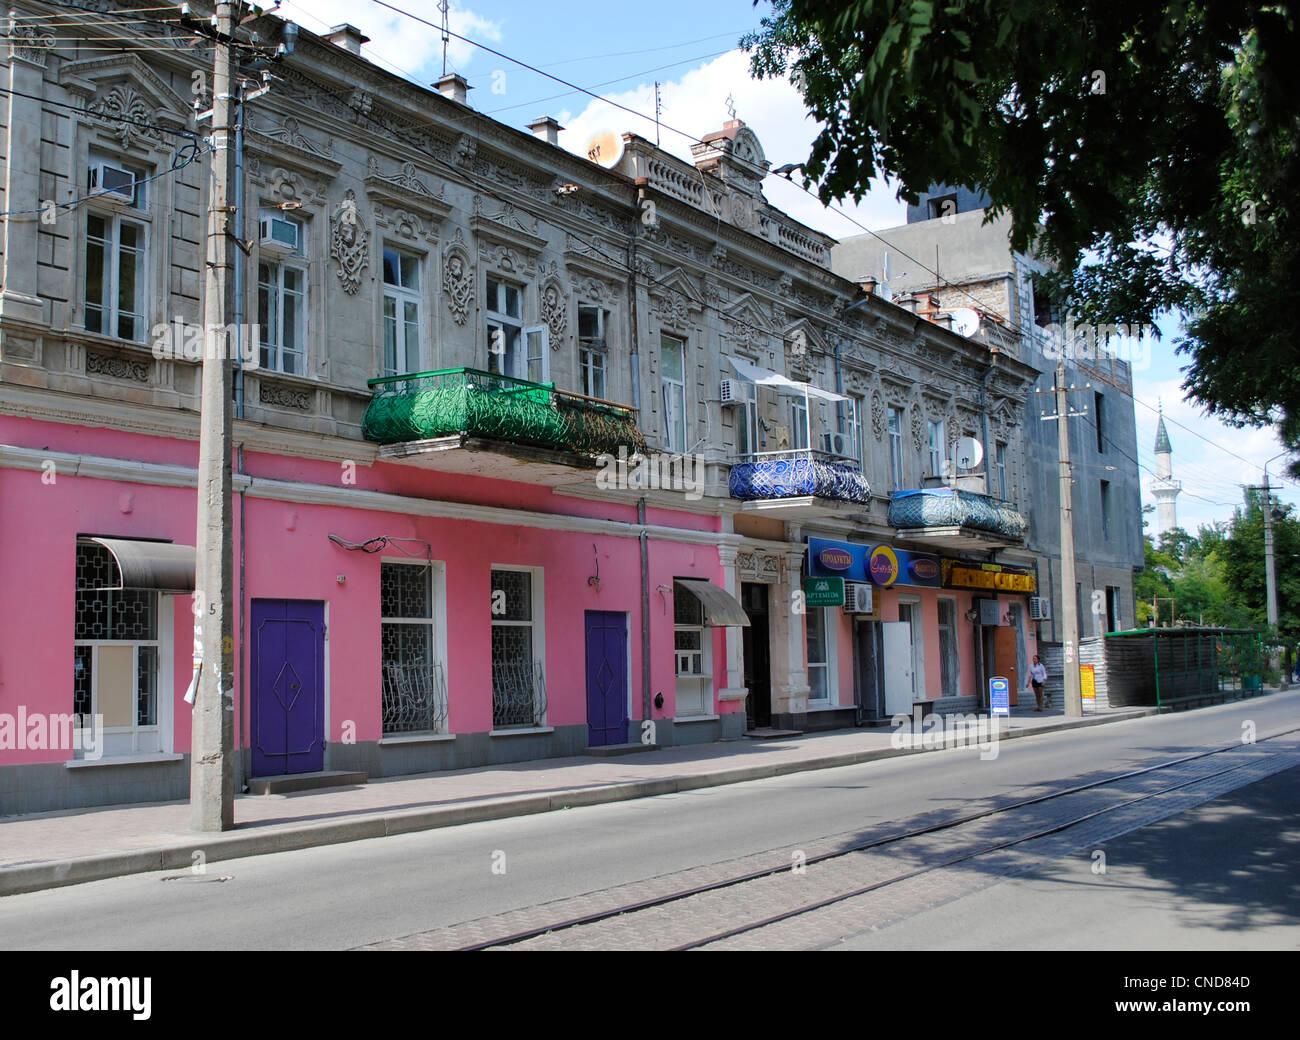 Ukraine. Autonomous Republic of Crimea. Yevpatoria. Revolution Street. Stock Photo